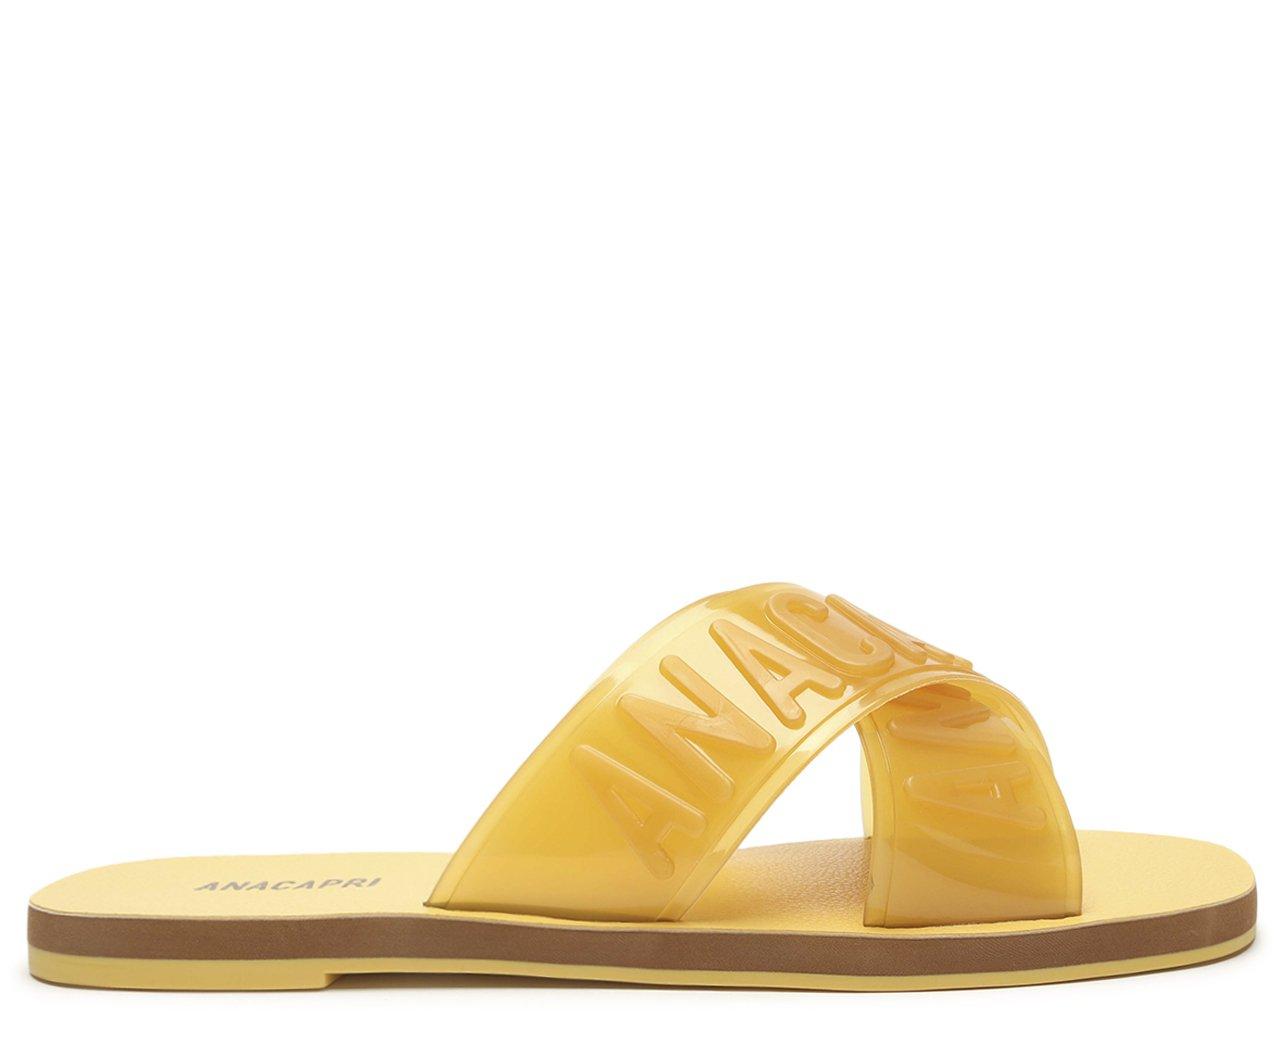 Rasteira Amarela Tiras Cruzadas Anacapri | Anacapri